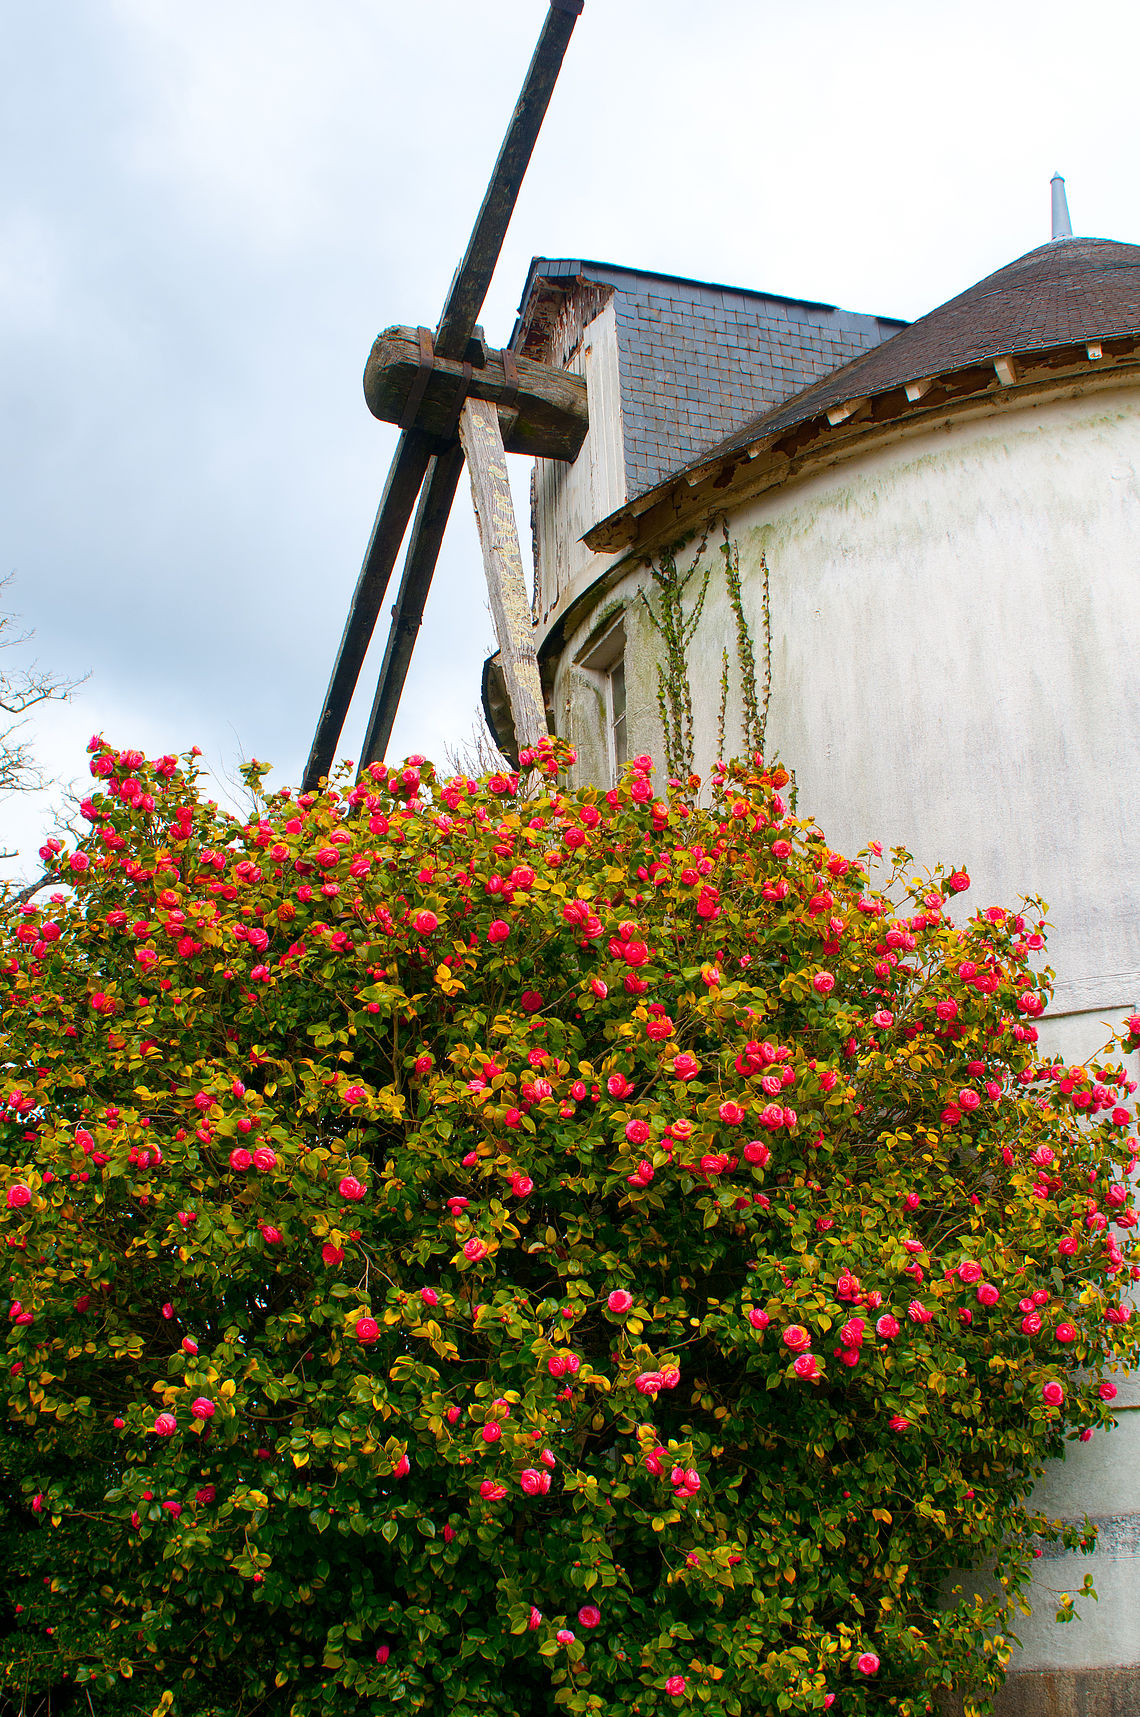 Le camellia, une rose chinoise